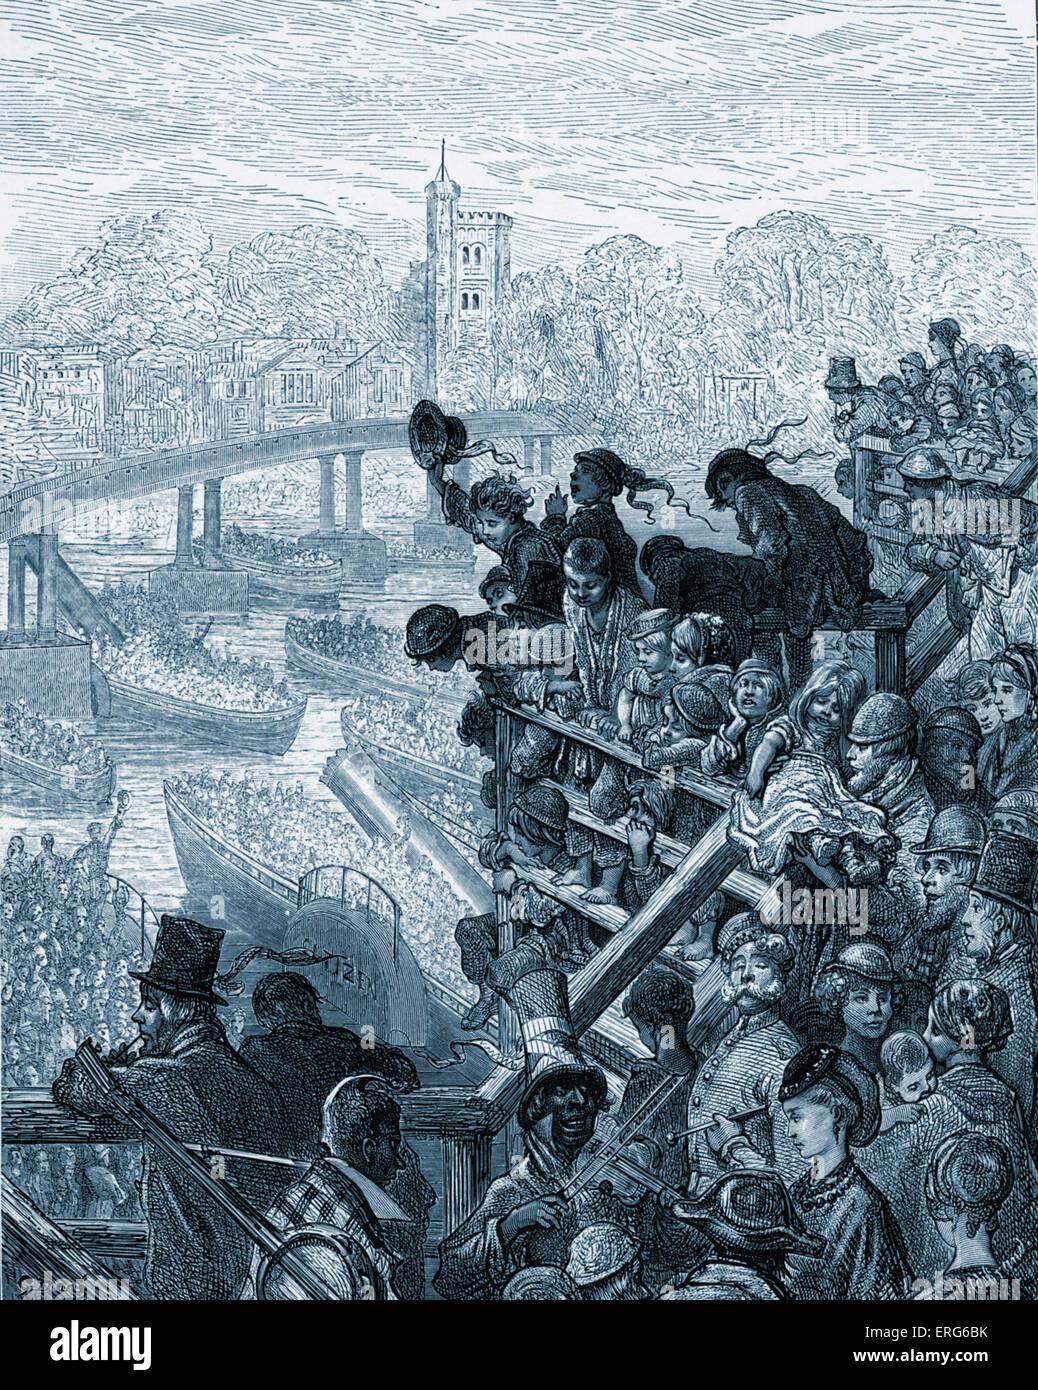 Oxford and Cambridge boat race passing under Putney Bridge, London.  Men, women and children leaning over bridge - Stock Image